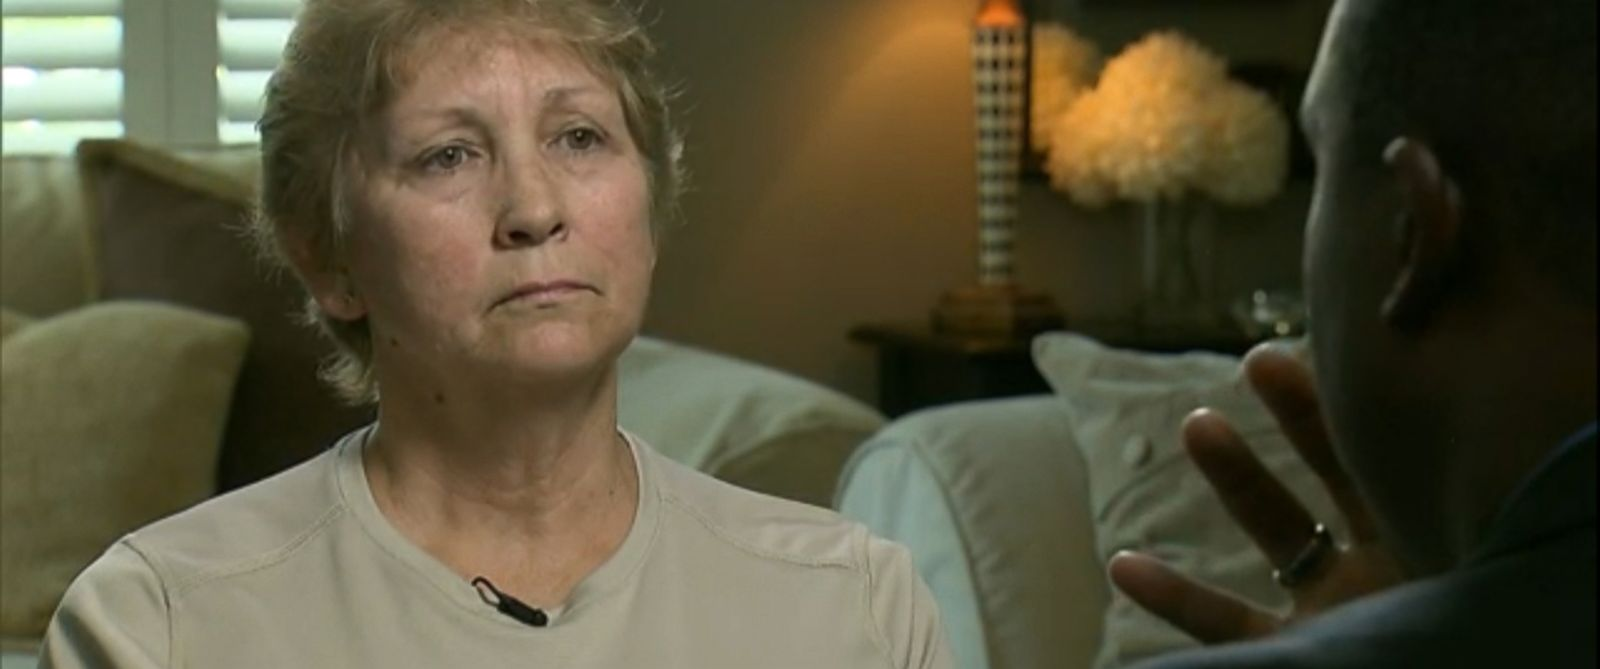 south carolina police officer s mom speaks out in tearful photo karen sharpe the mother of former north charleston police officer michael slager